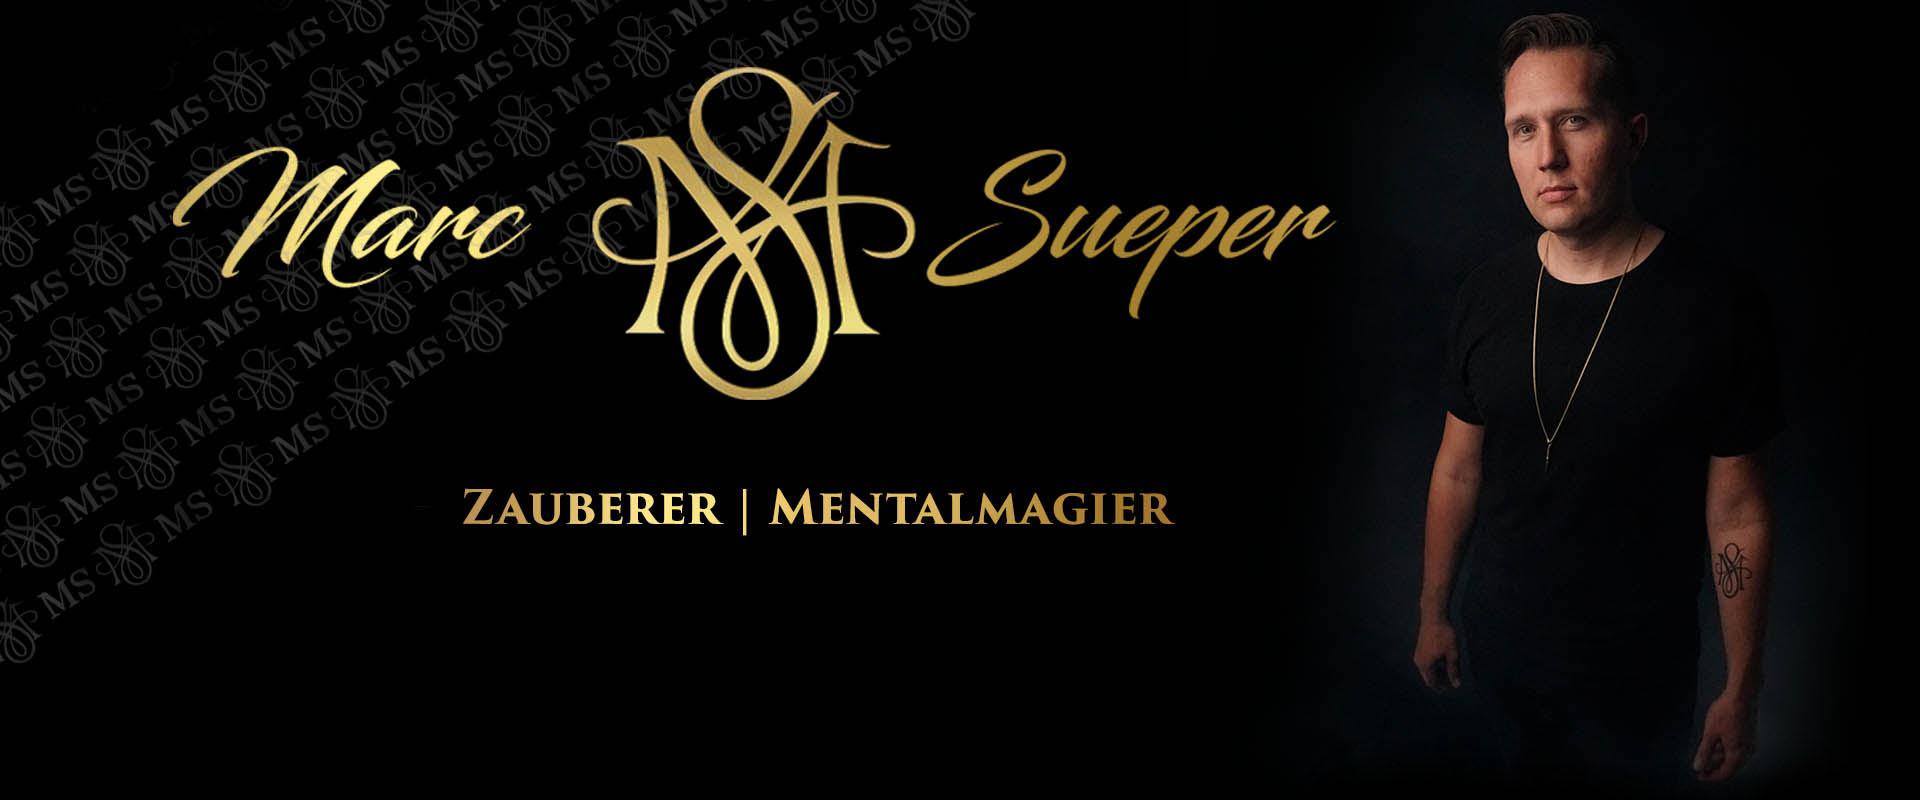 Zauberer & Mentalmagier Marc Sueper